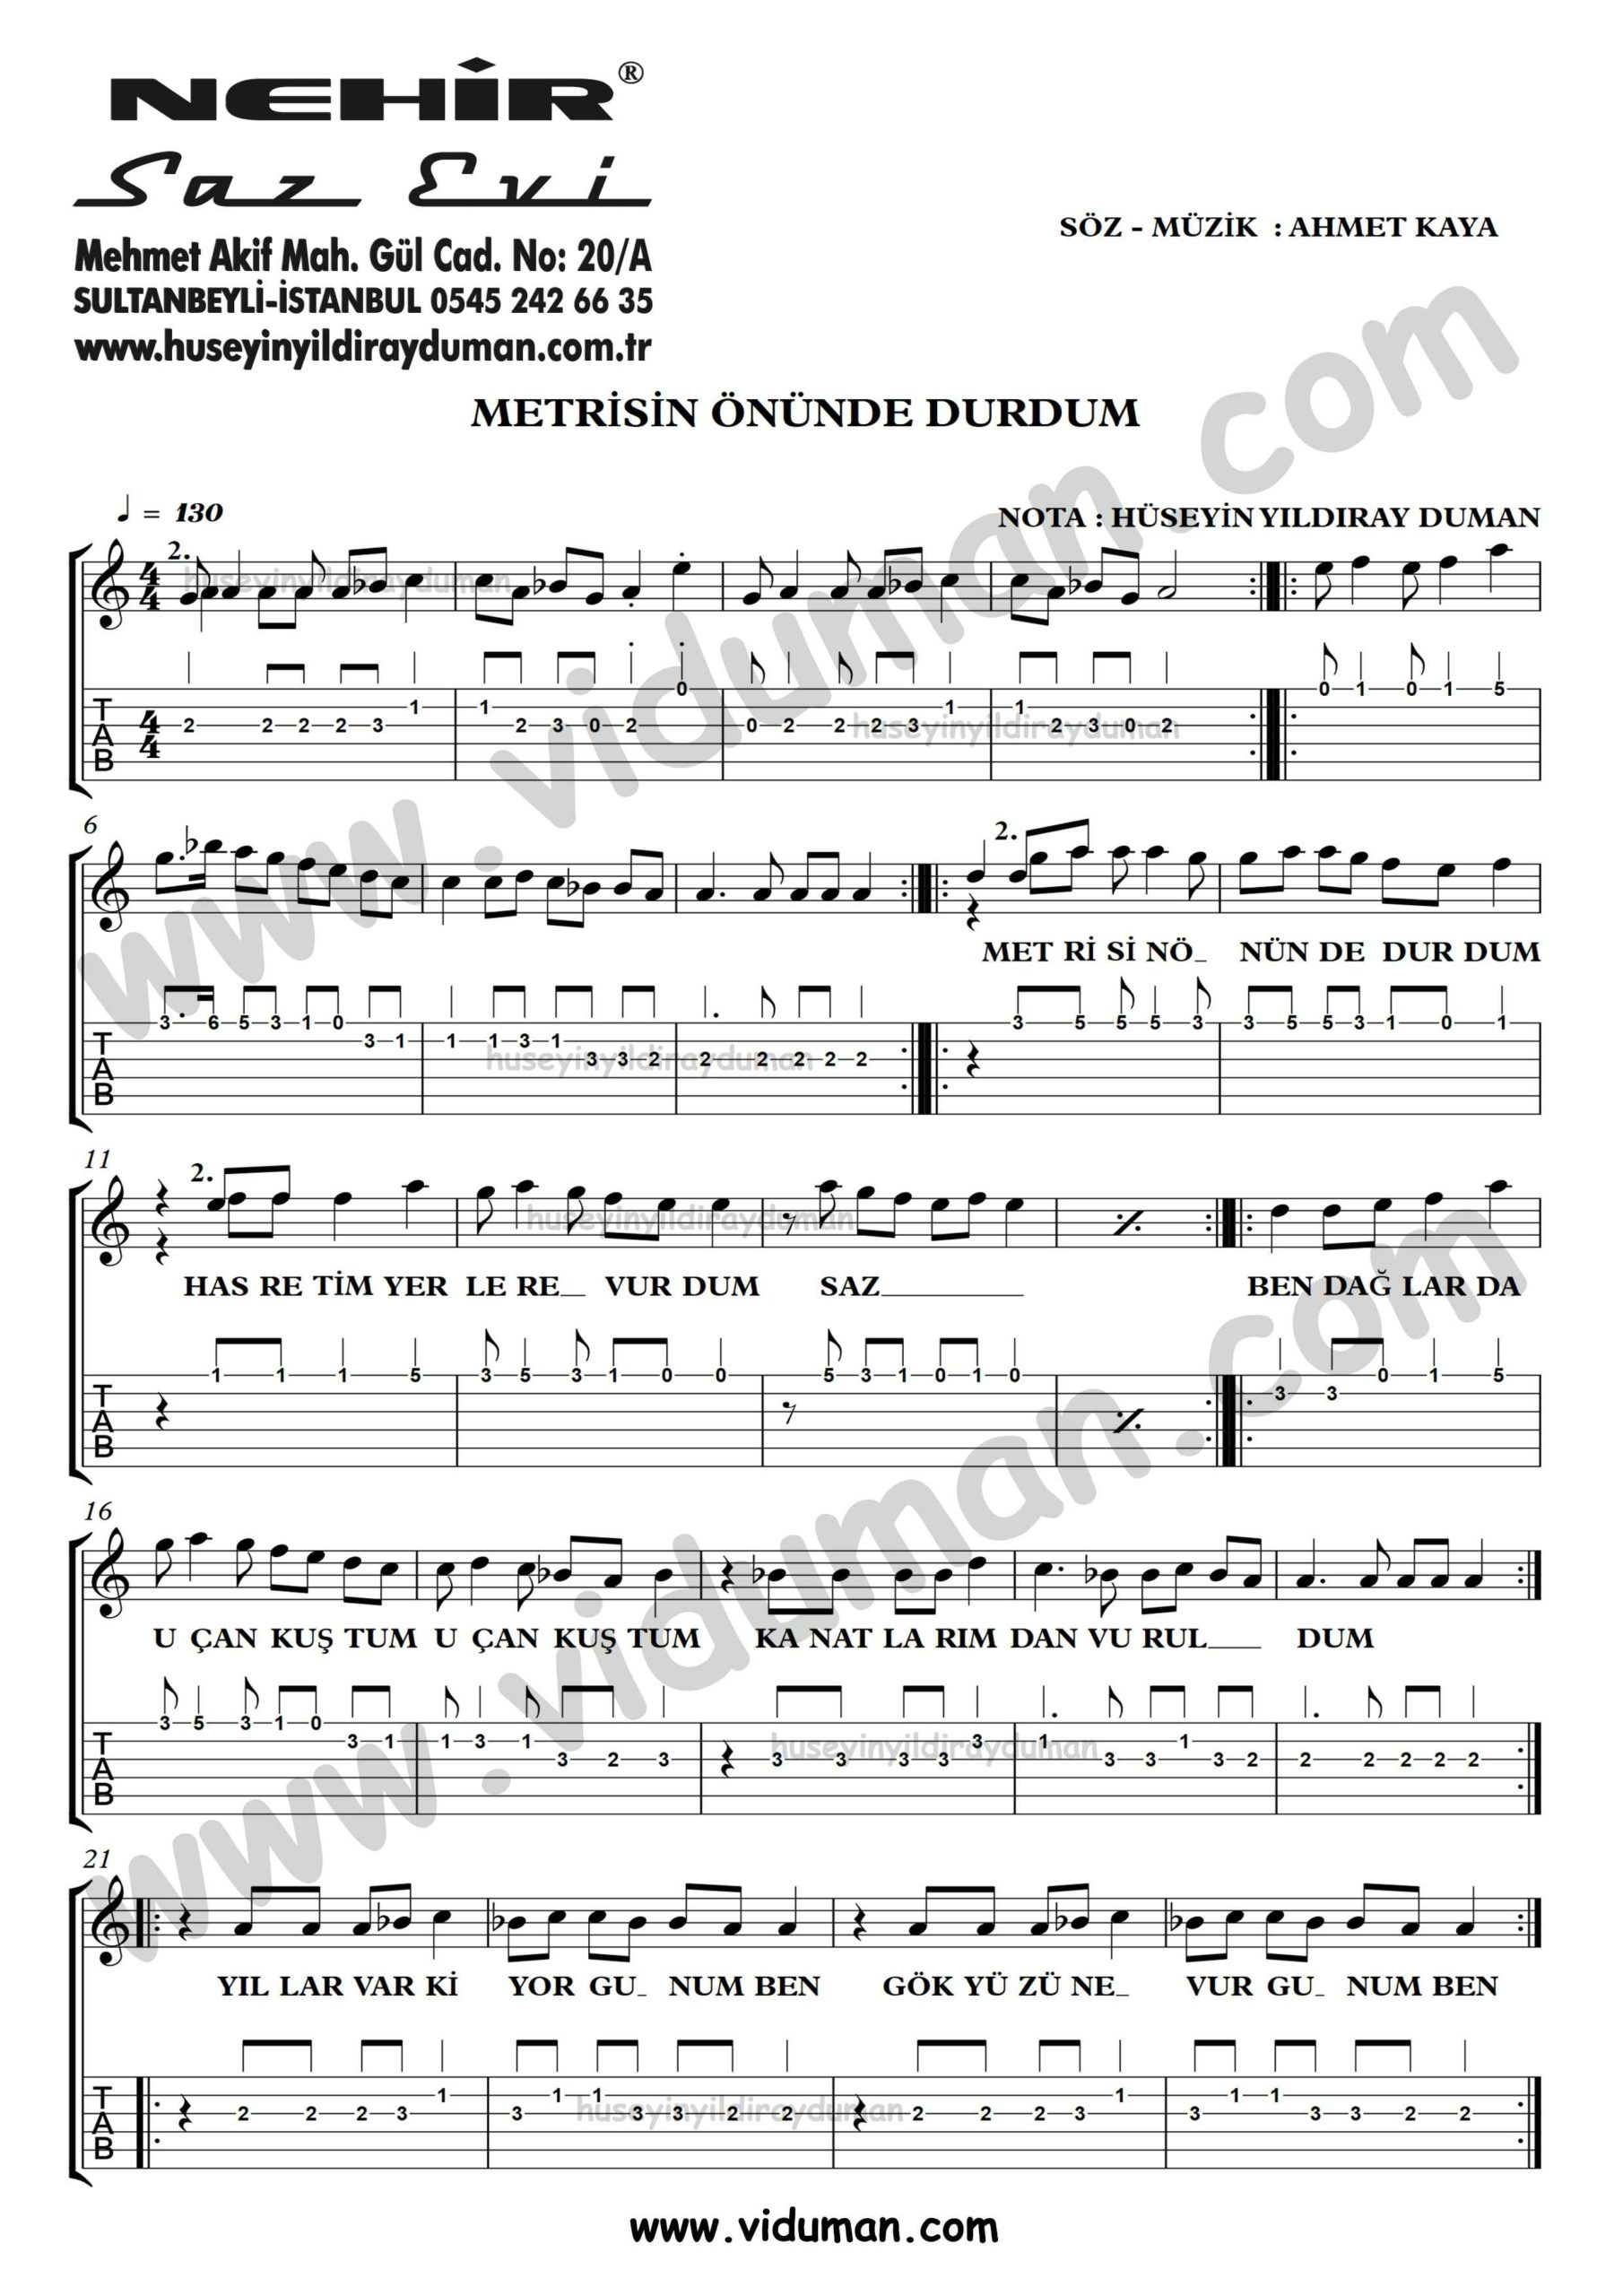 Metrisin Onunde Durdum_1-Ahmet Kaya-Gitar Tab-Solo Notalari